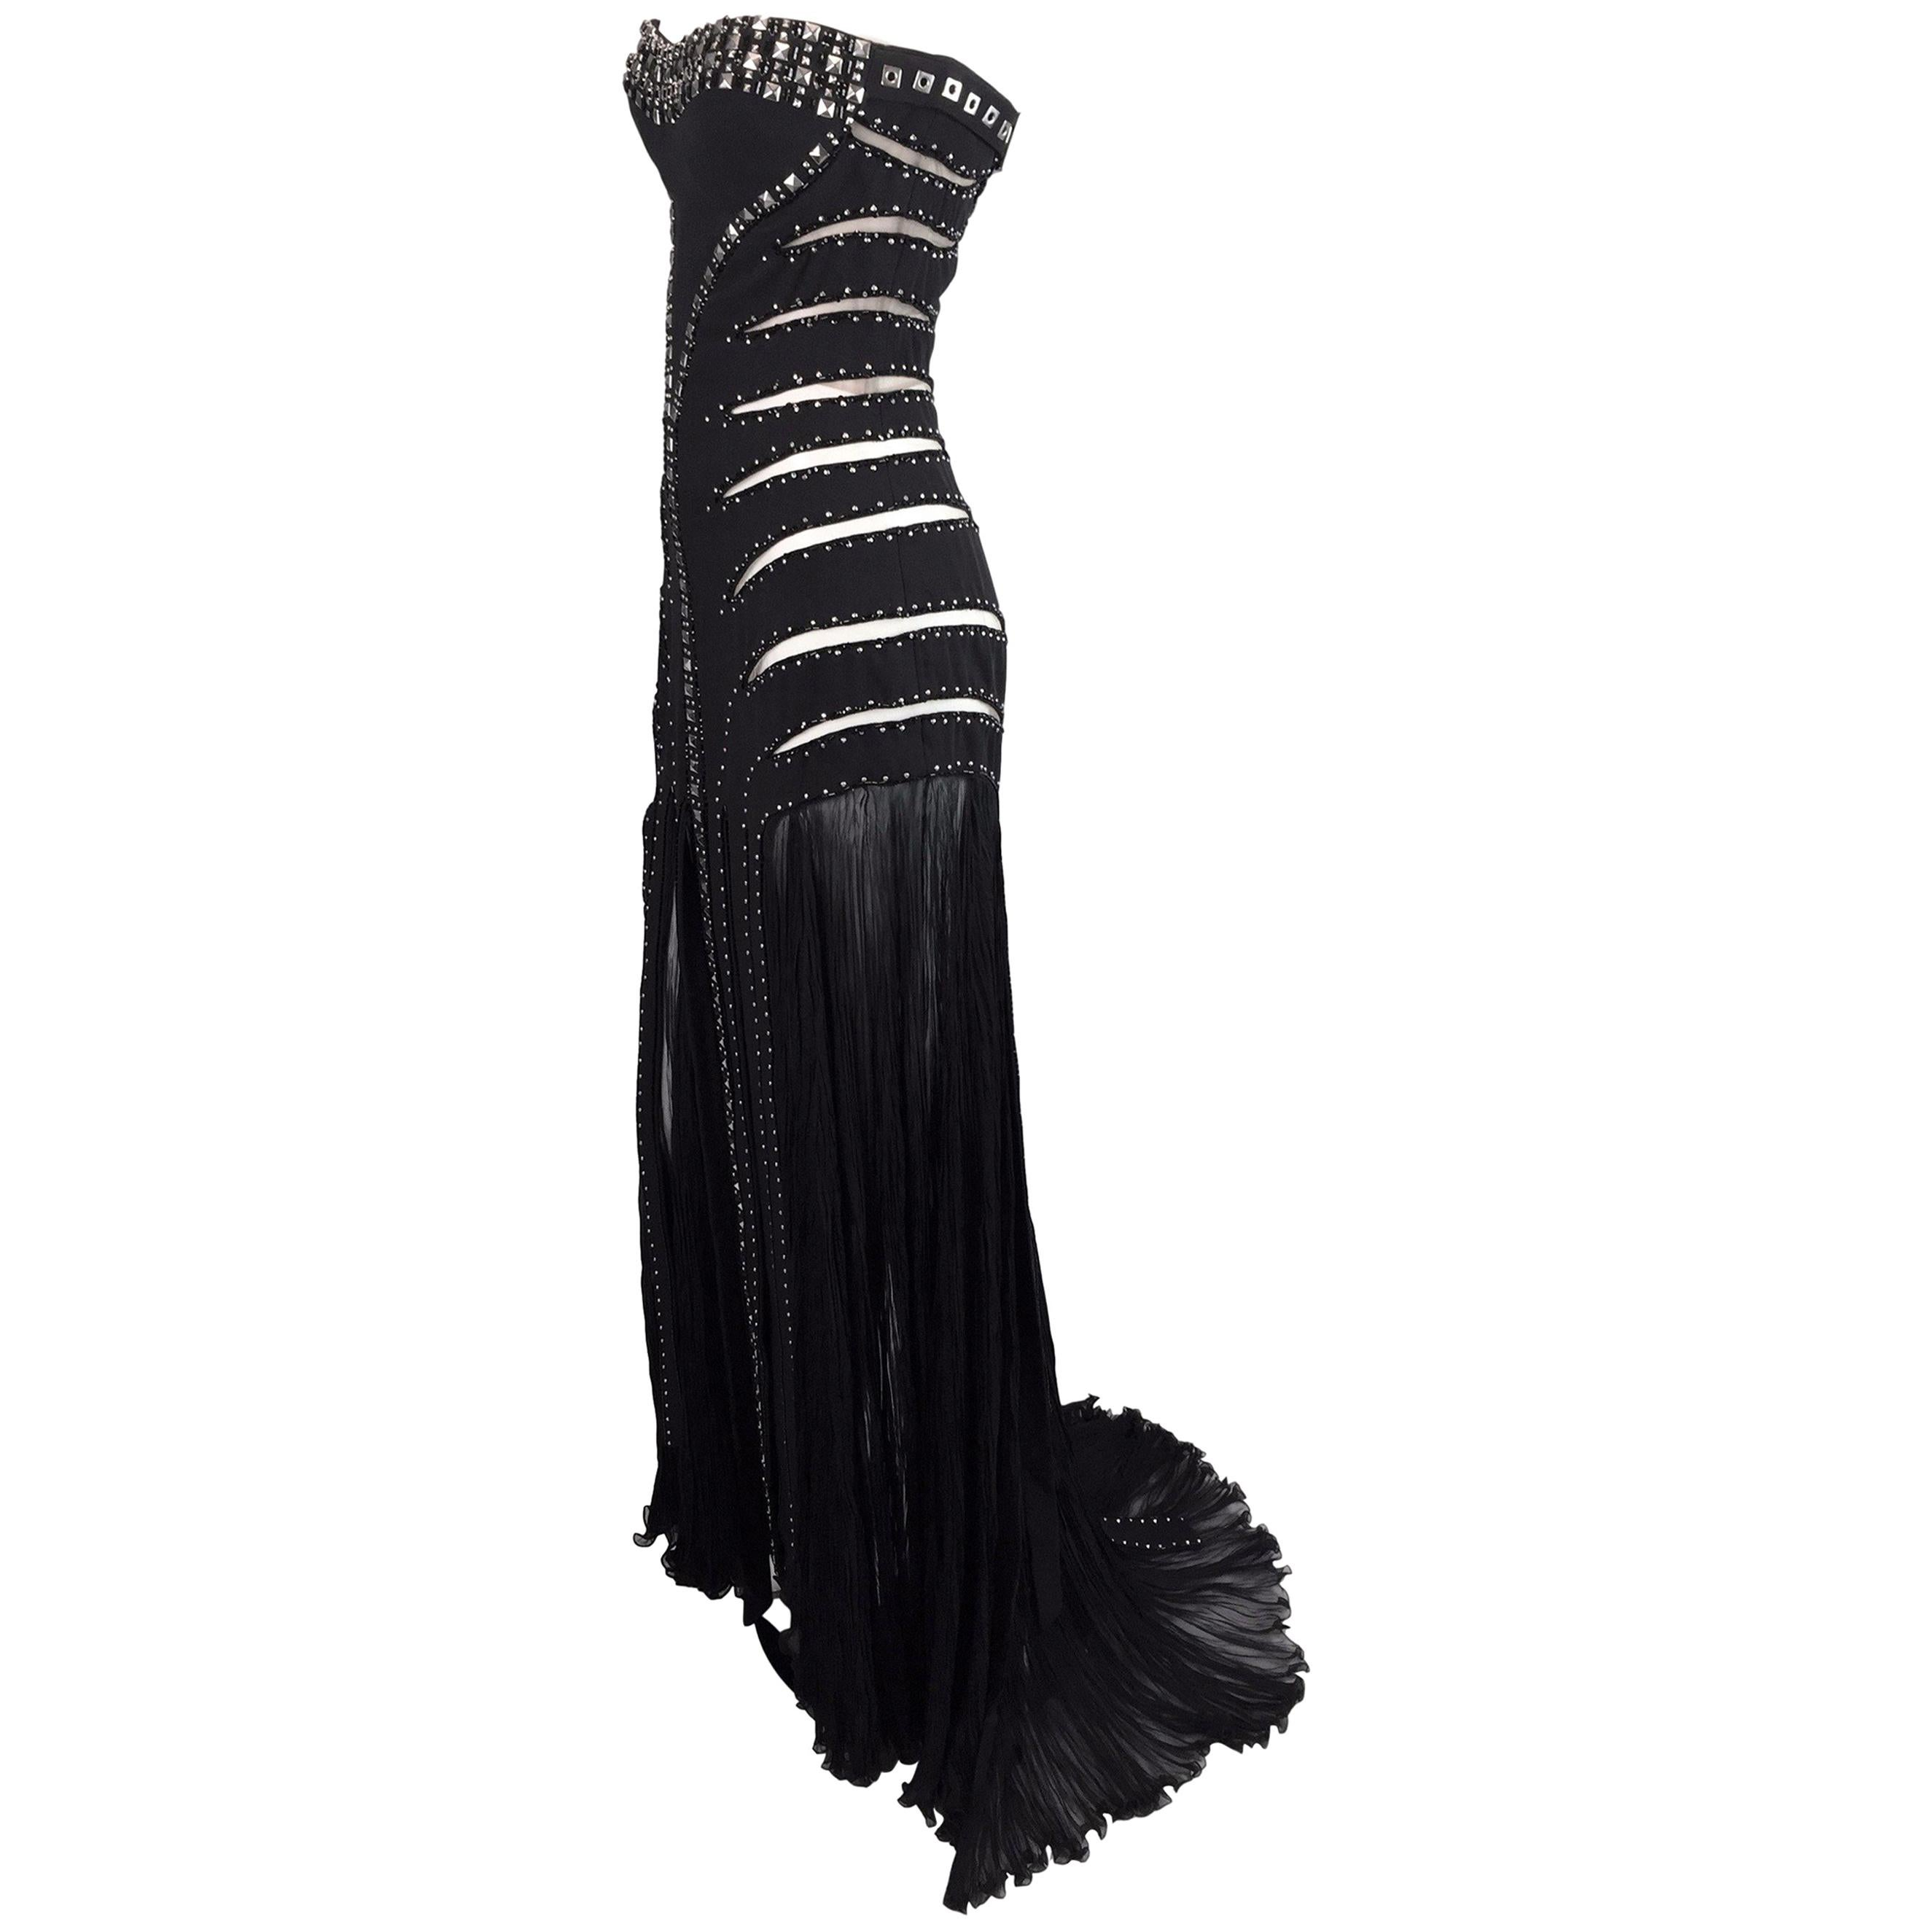 F/W 2004 Runway Atelier Versace Black Sheer Mesh Cut Out Studs Beaded Gown Dress